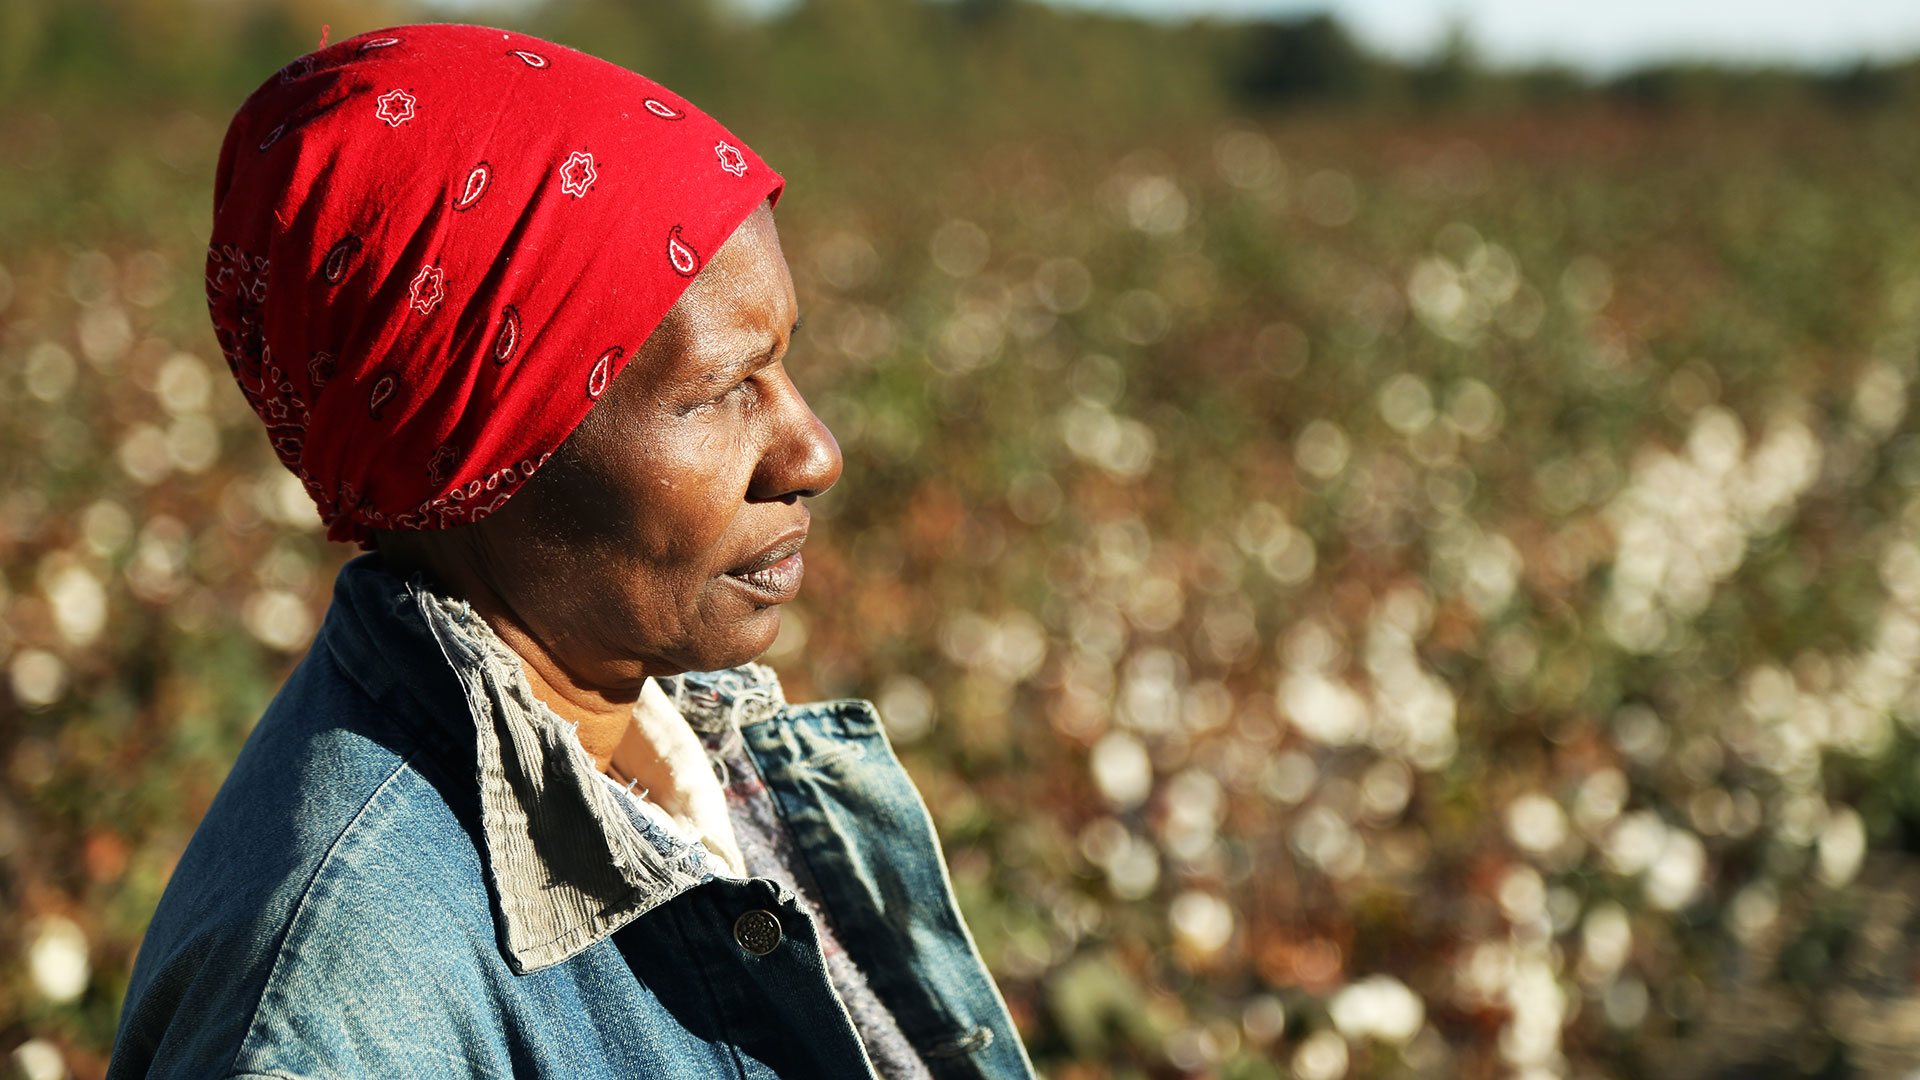 Wilhemina Dixon, star of Wilhemina's War, looks across a field, while wearing a red bandanna